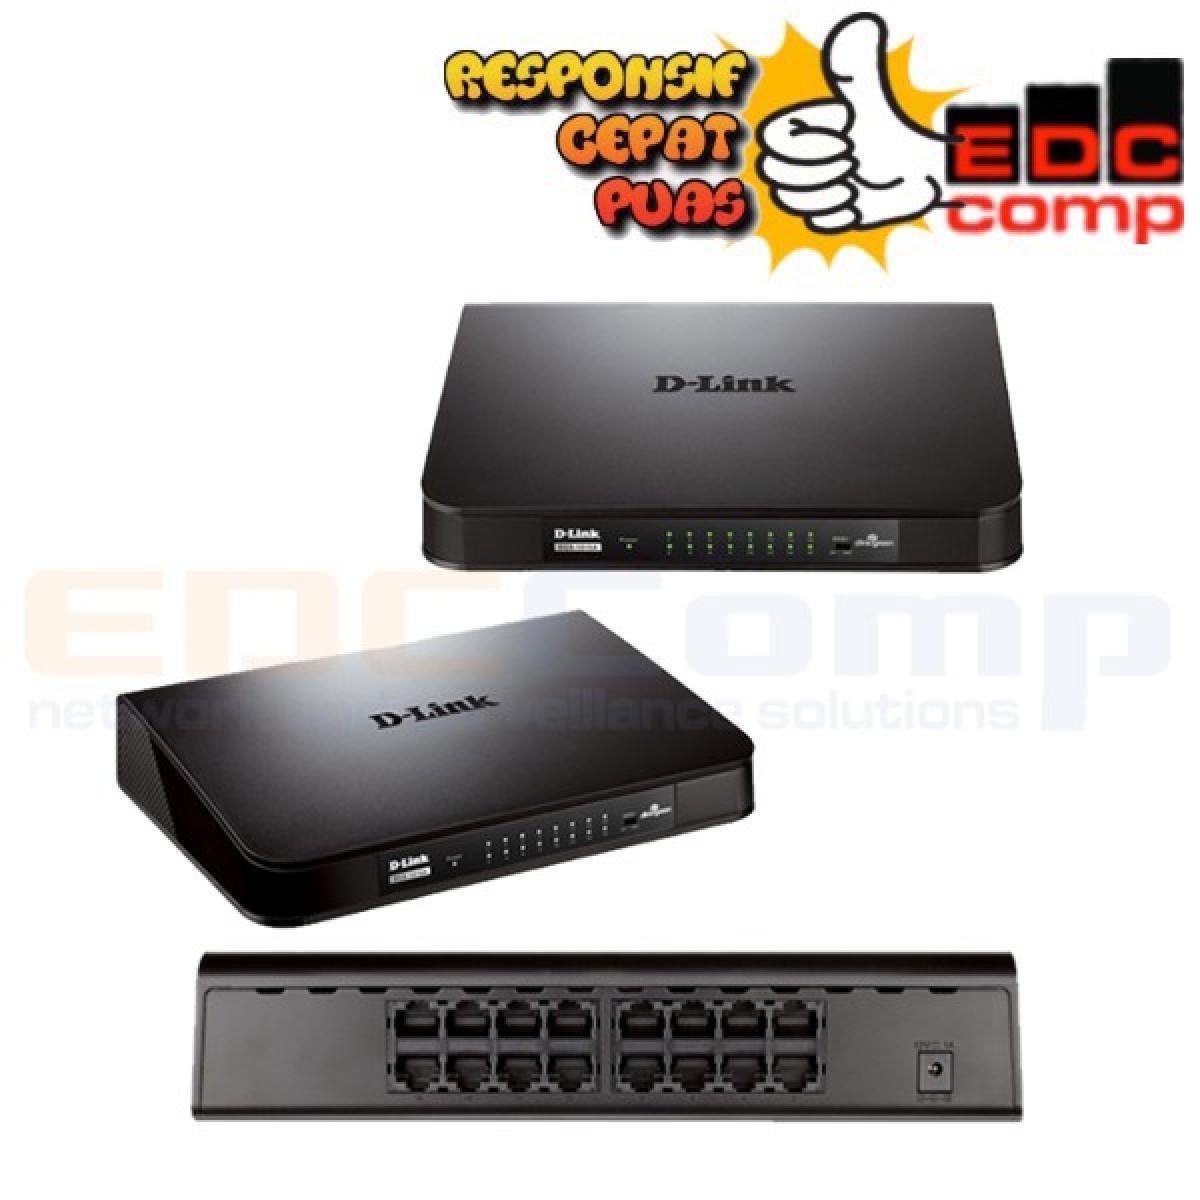 D-Link 16 Port Gigabit DGS-1016A / Switch 16 Port Gigabit D-Link - EdcComp